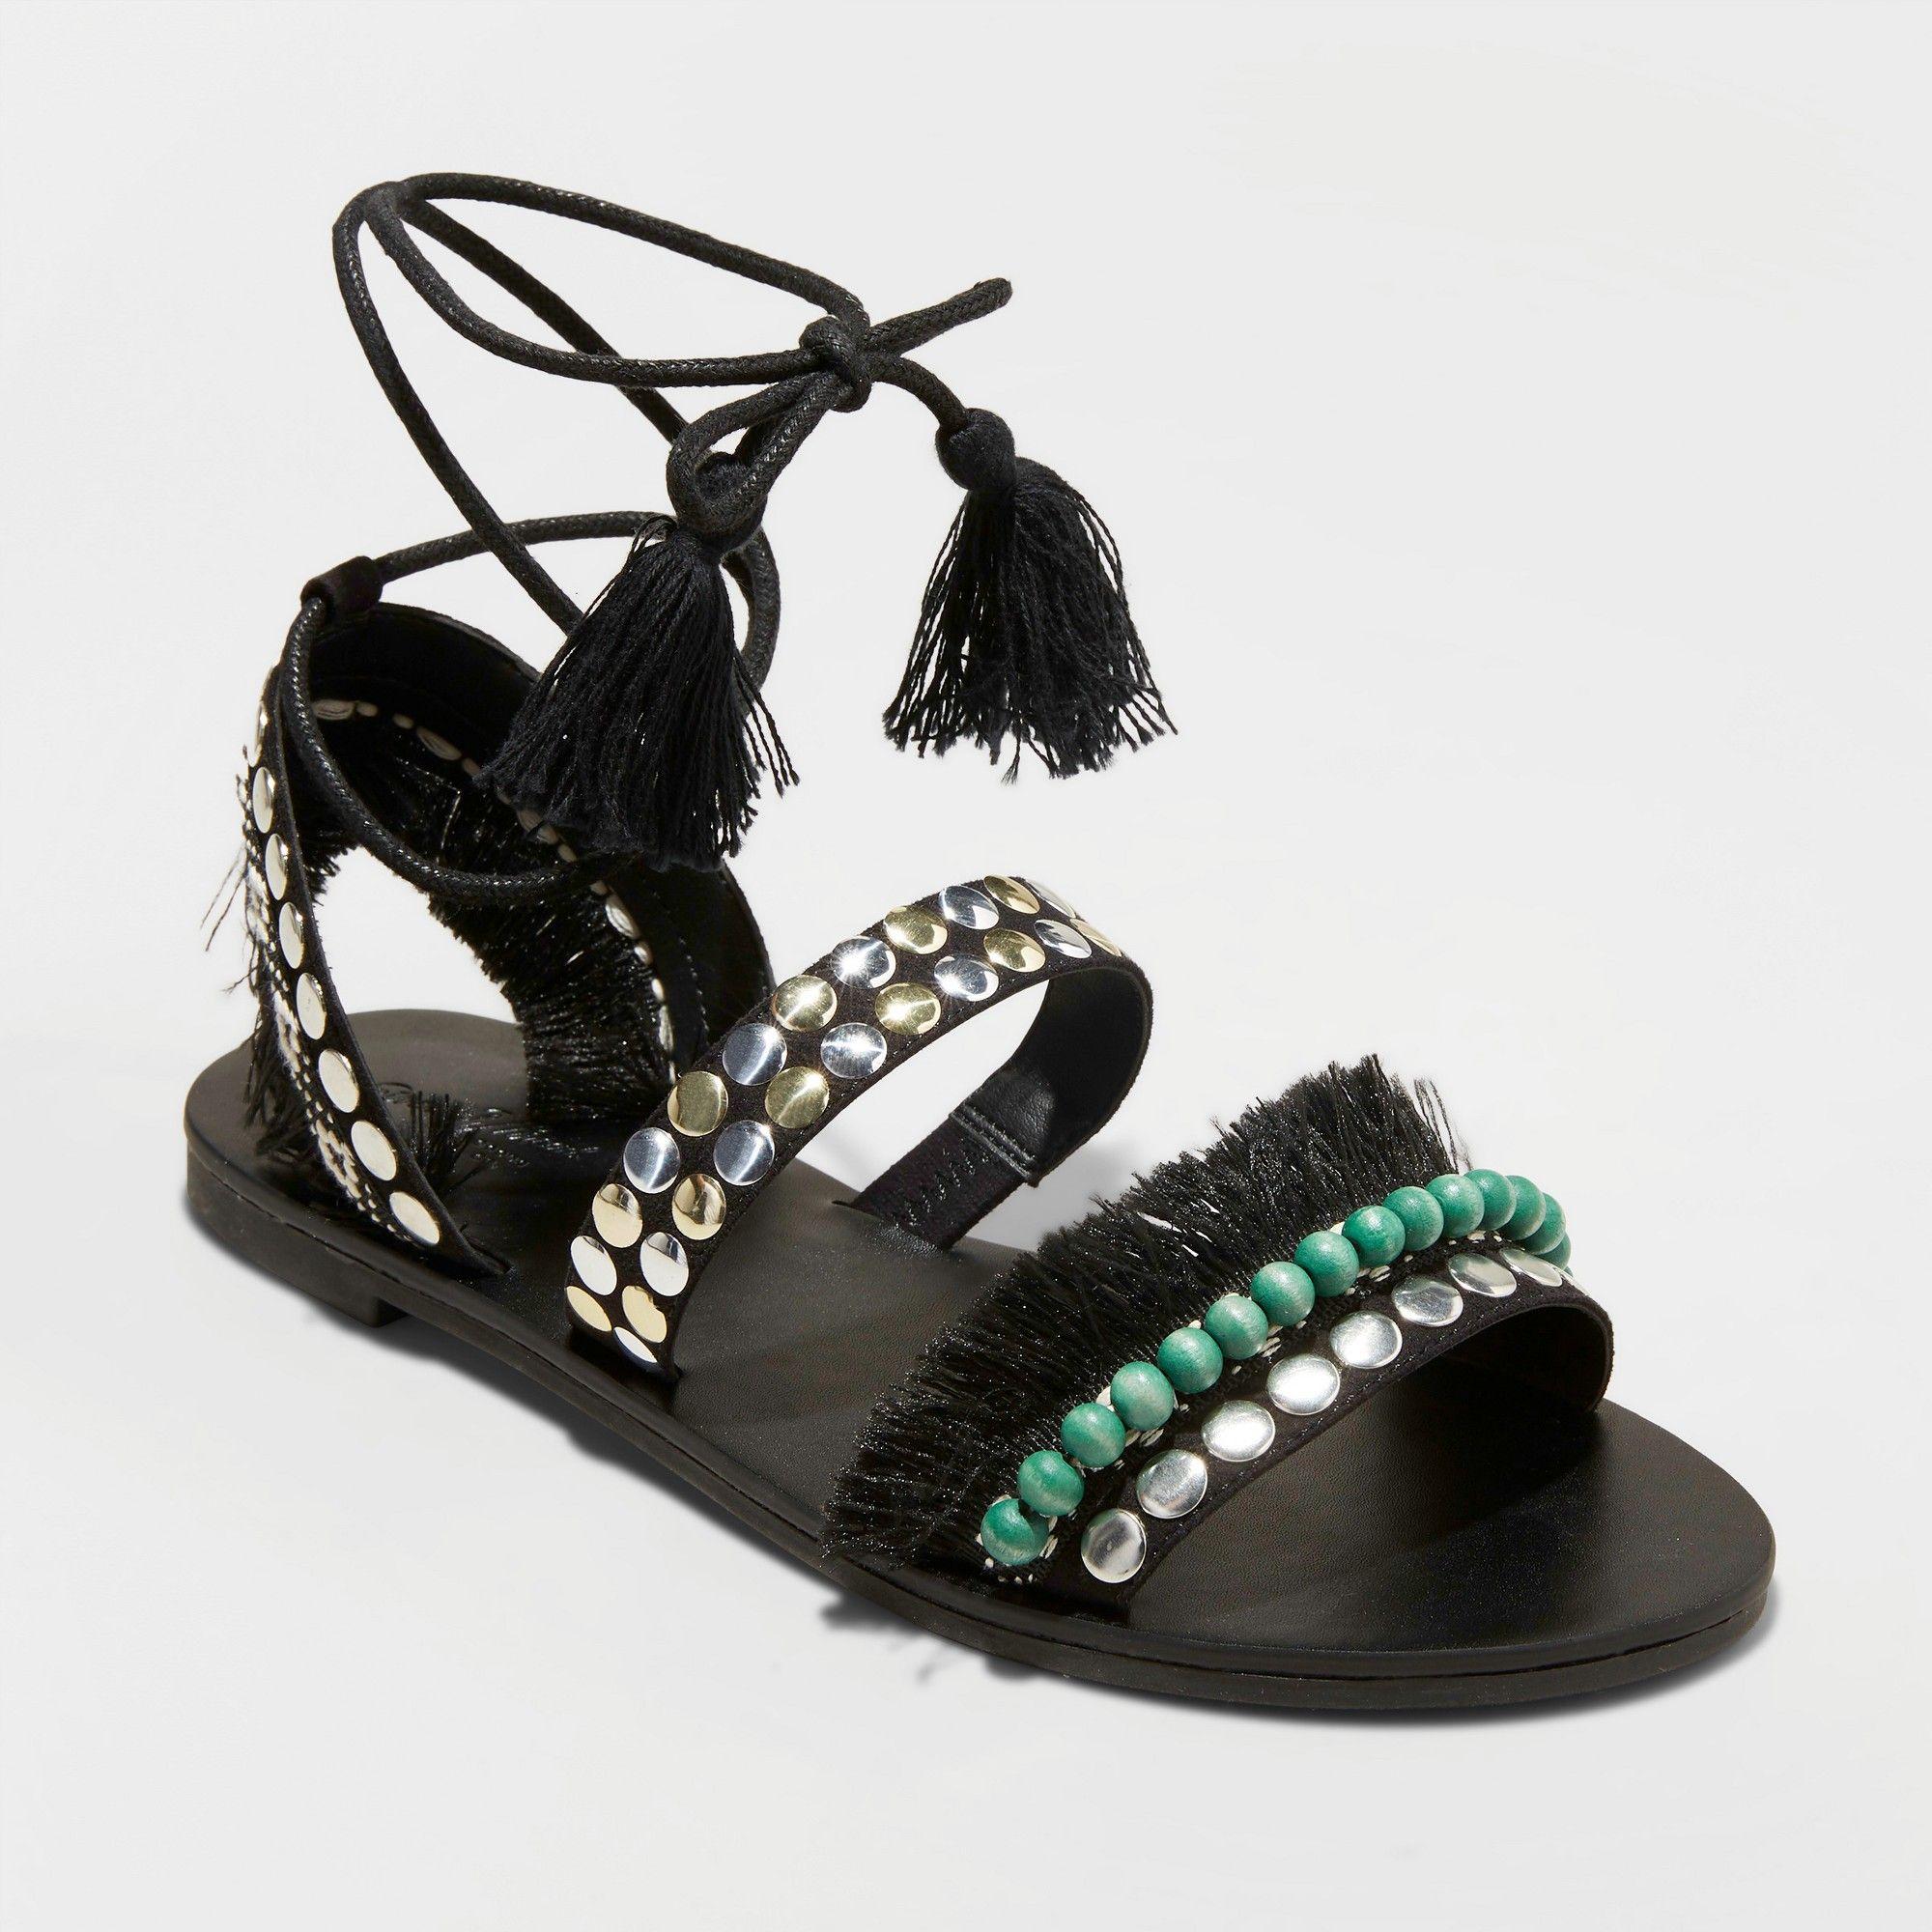 8f90af17c61 Women s Samaya Gladiator Sandals - Universal Thread Black 7.5 ...